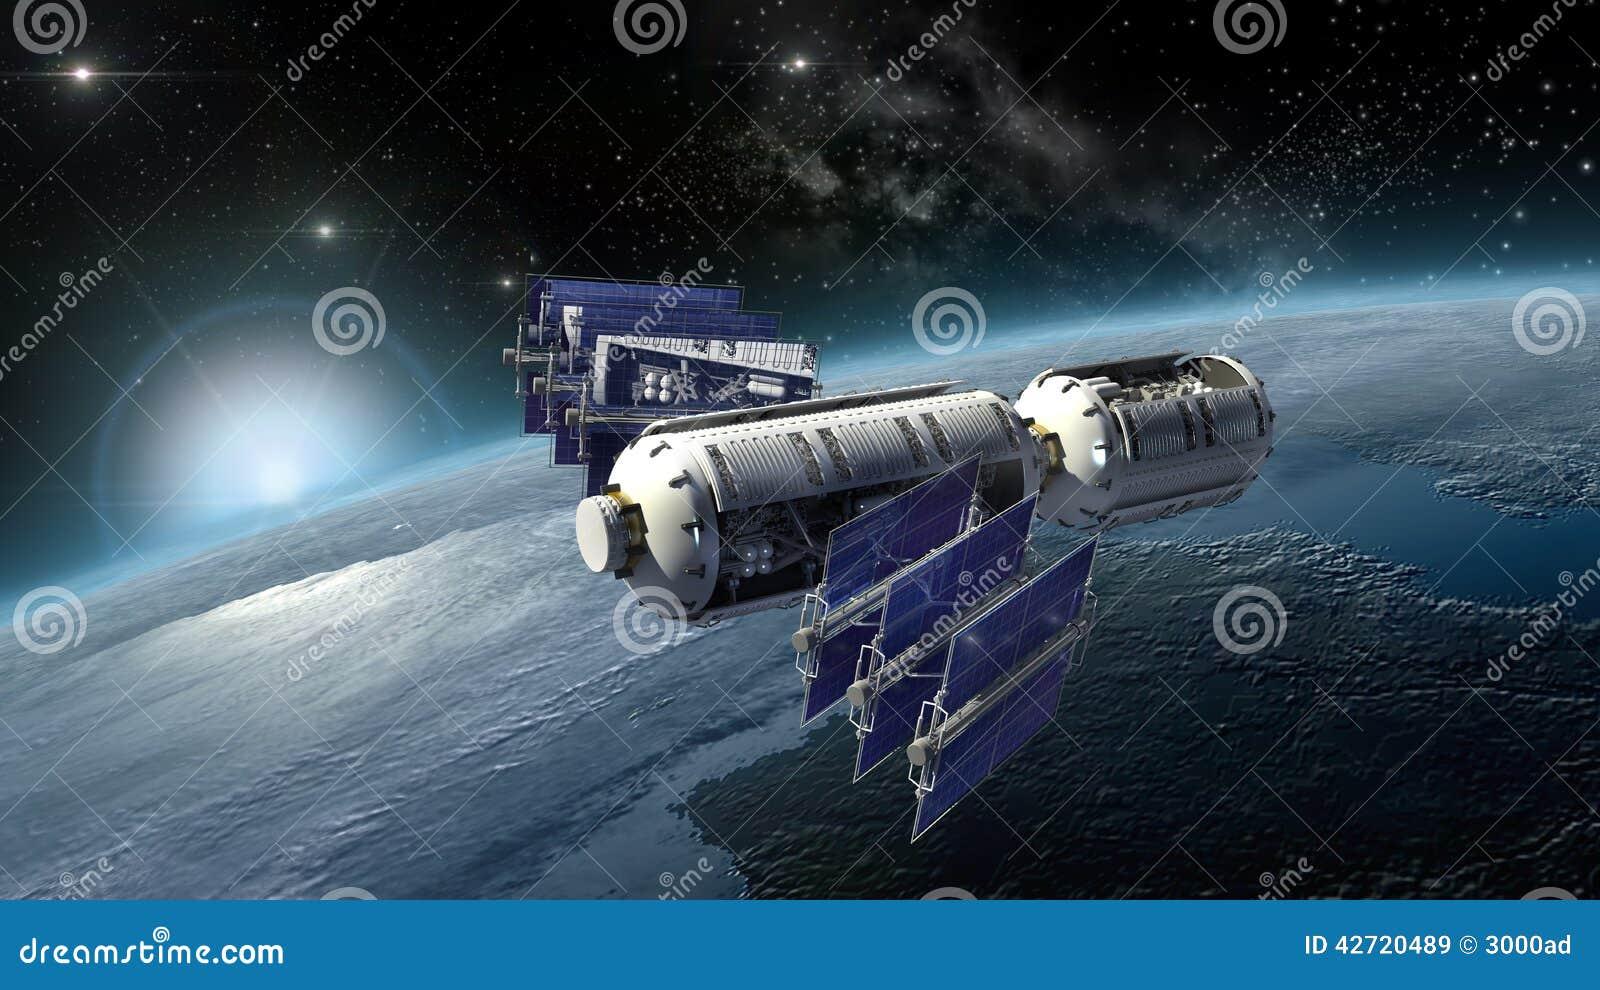 Satellite Spacelab Or Spacecraft Surveying Earth Stock Image